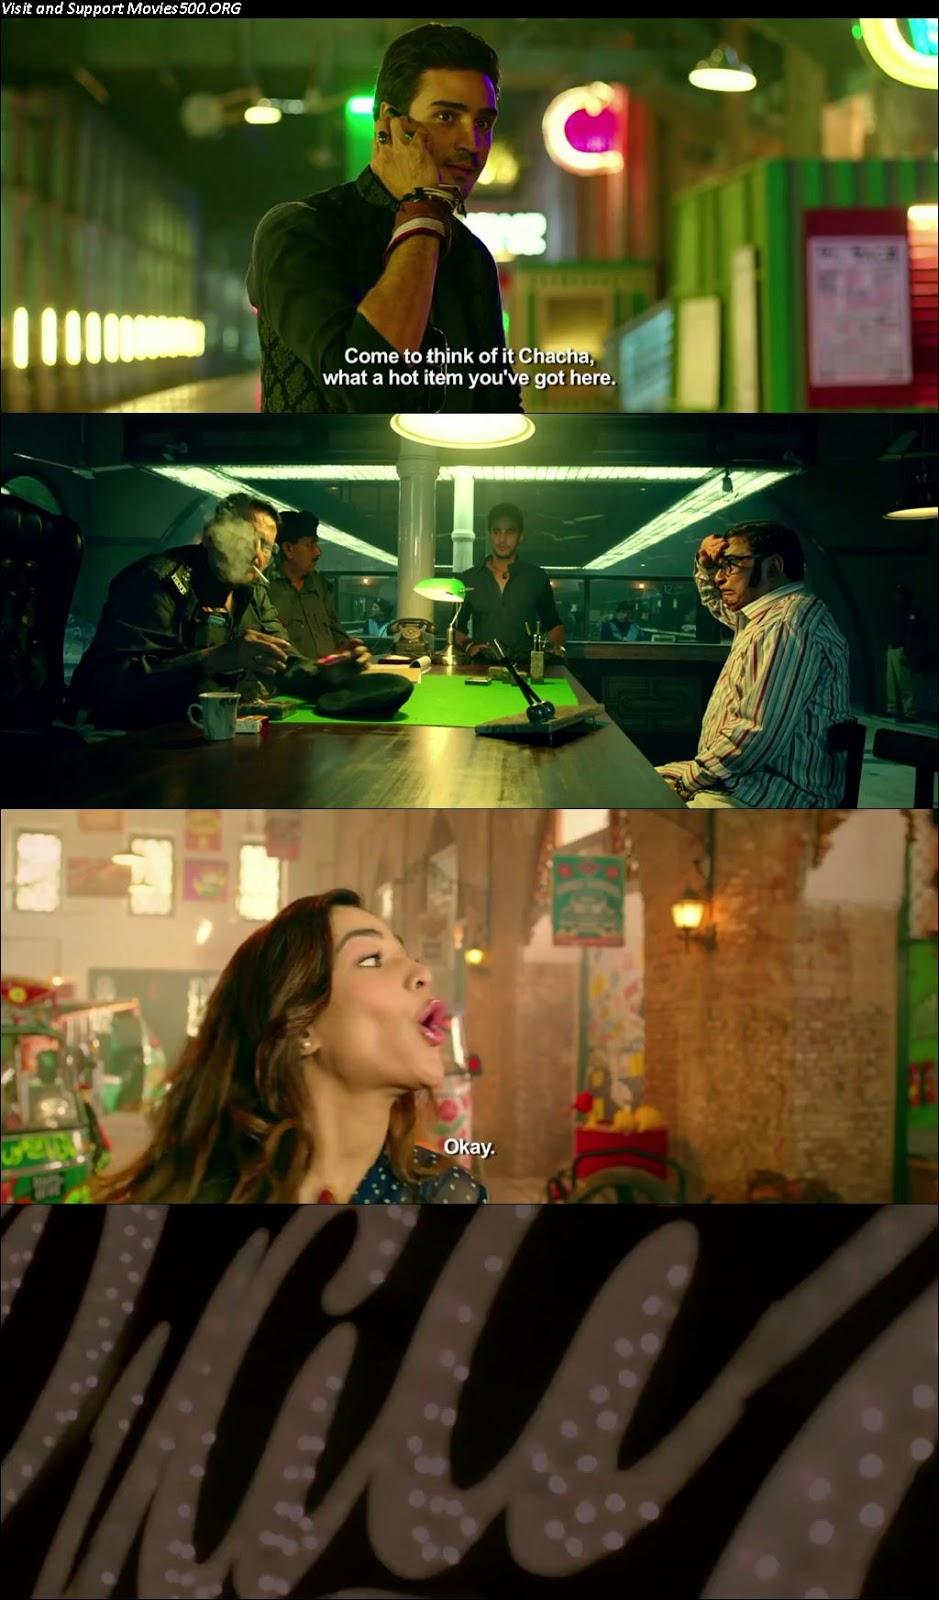 Dekh Magar Pyaar Say 2015 Urdu Pakistani Movie Download WEB DL 720p at movies500.info